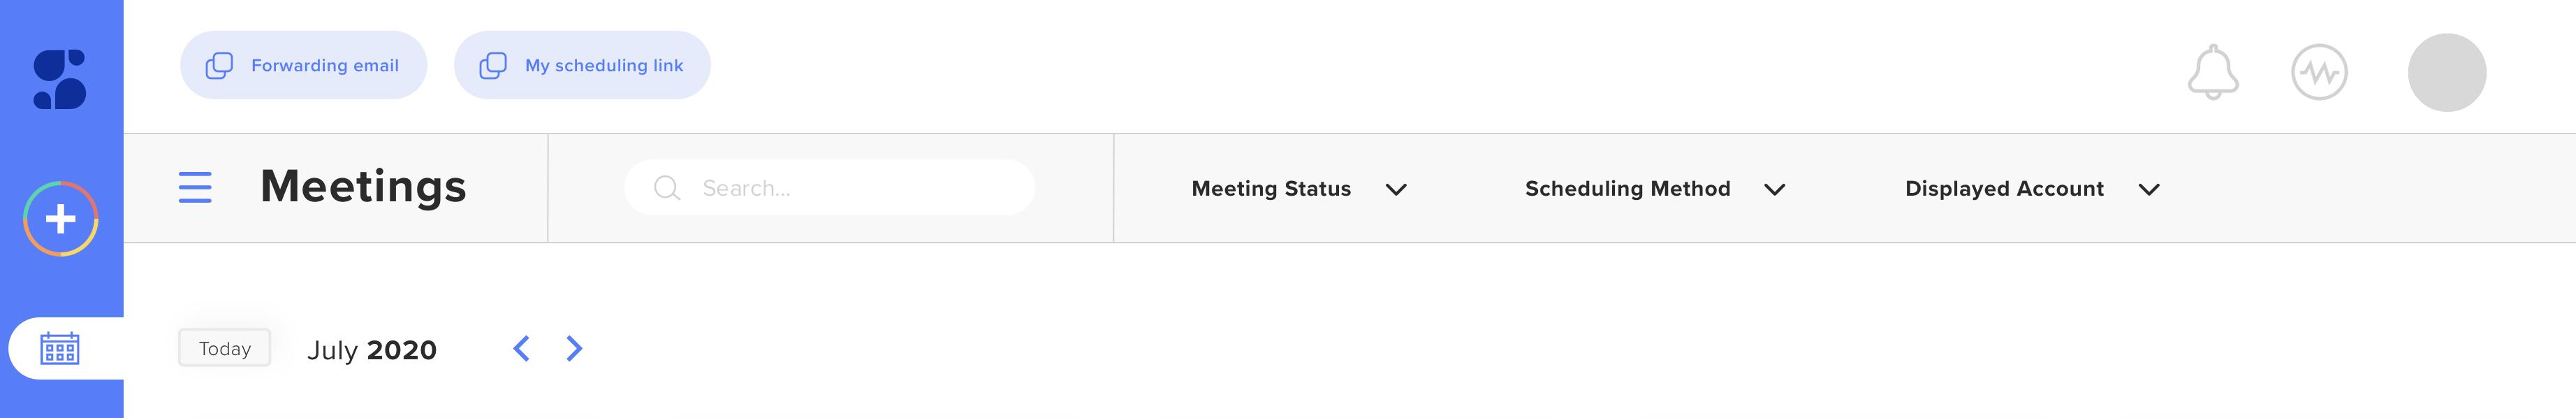 Sidekick Ai Scheduling App Dashboard